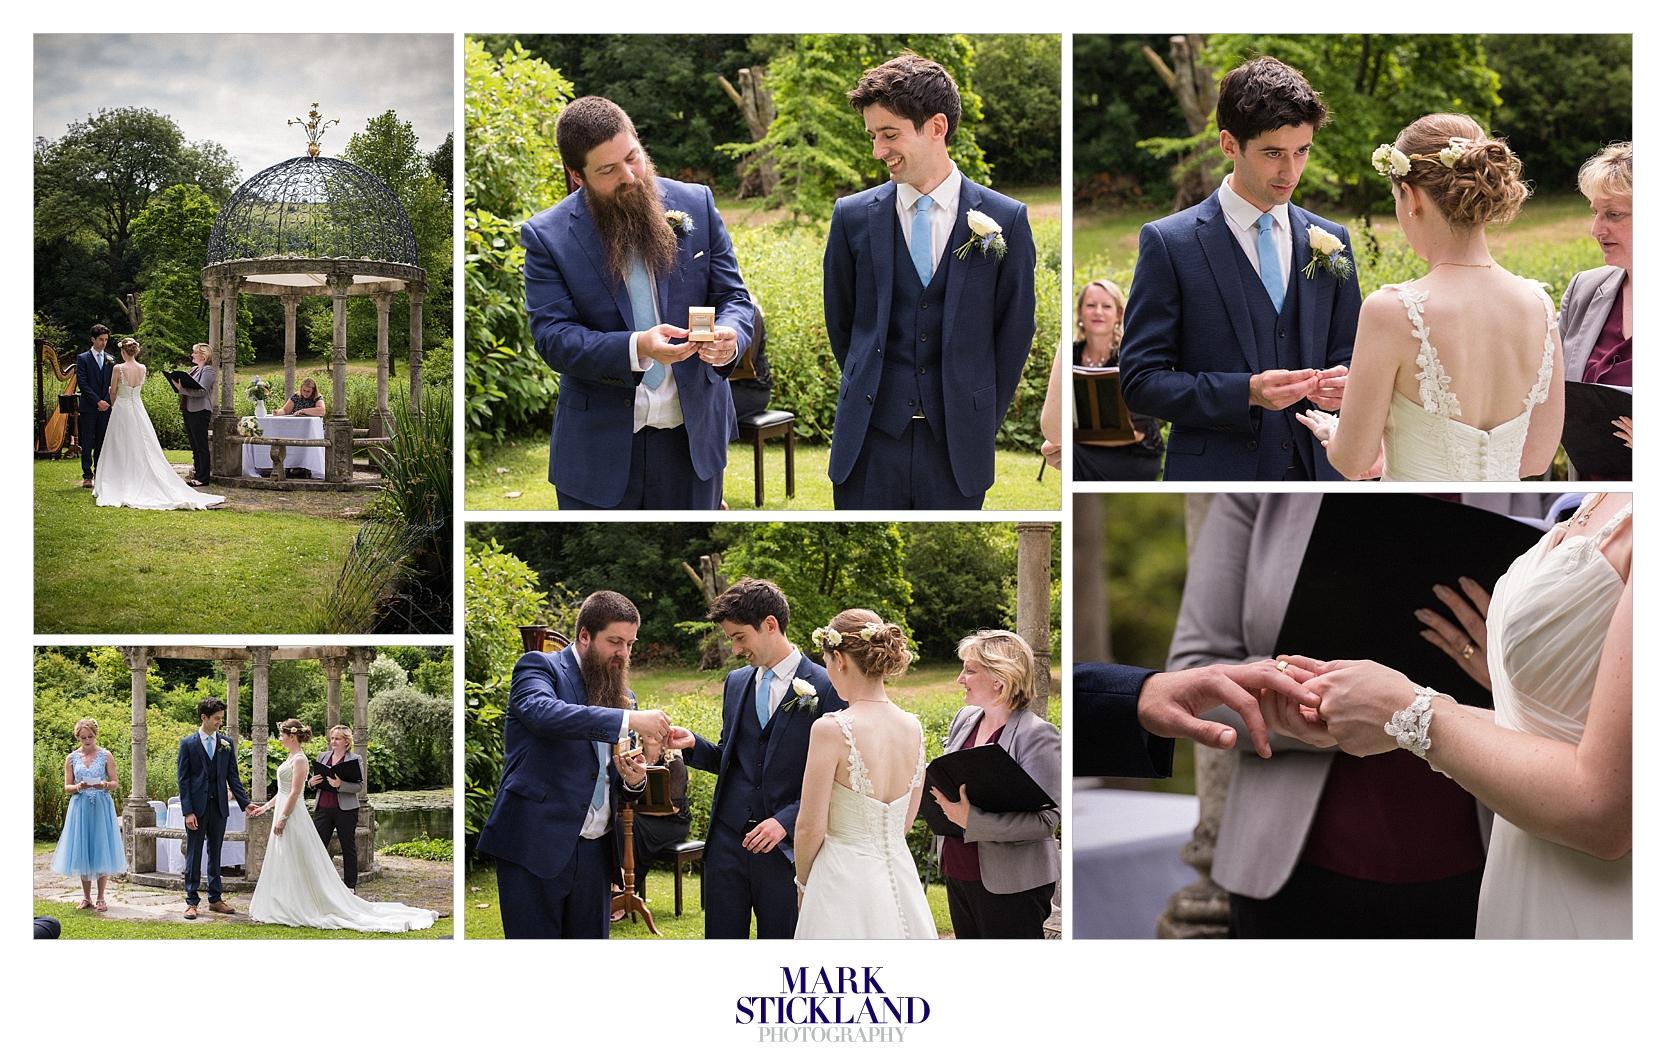 Springhead_wedding_fontmell magna_dorset_0004